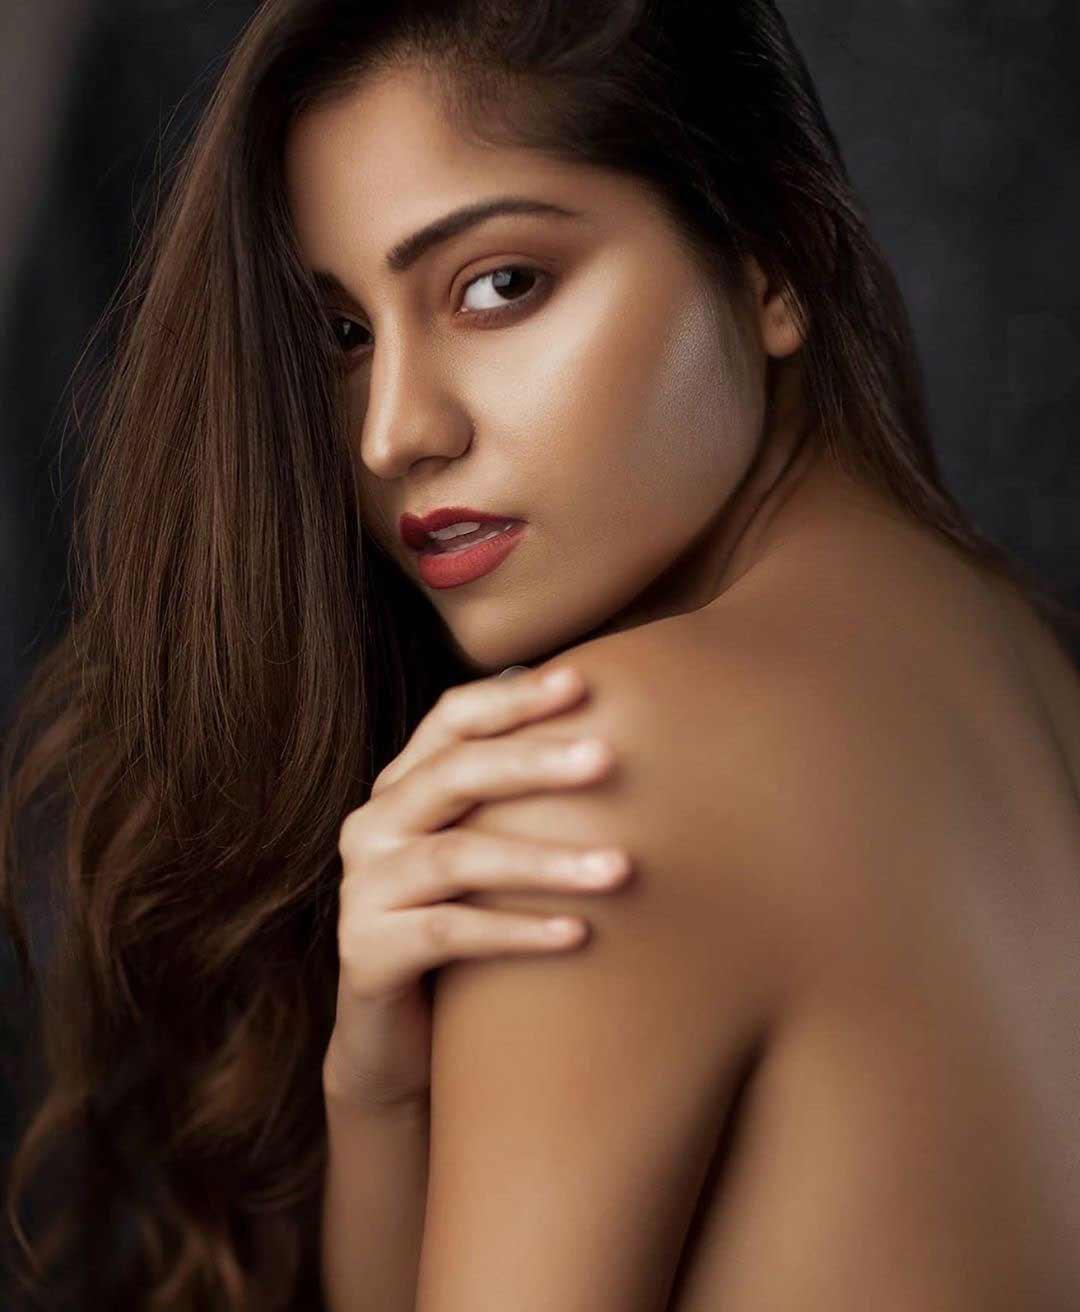 symrann k hot topless  nude